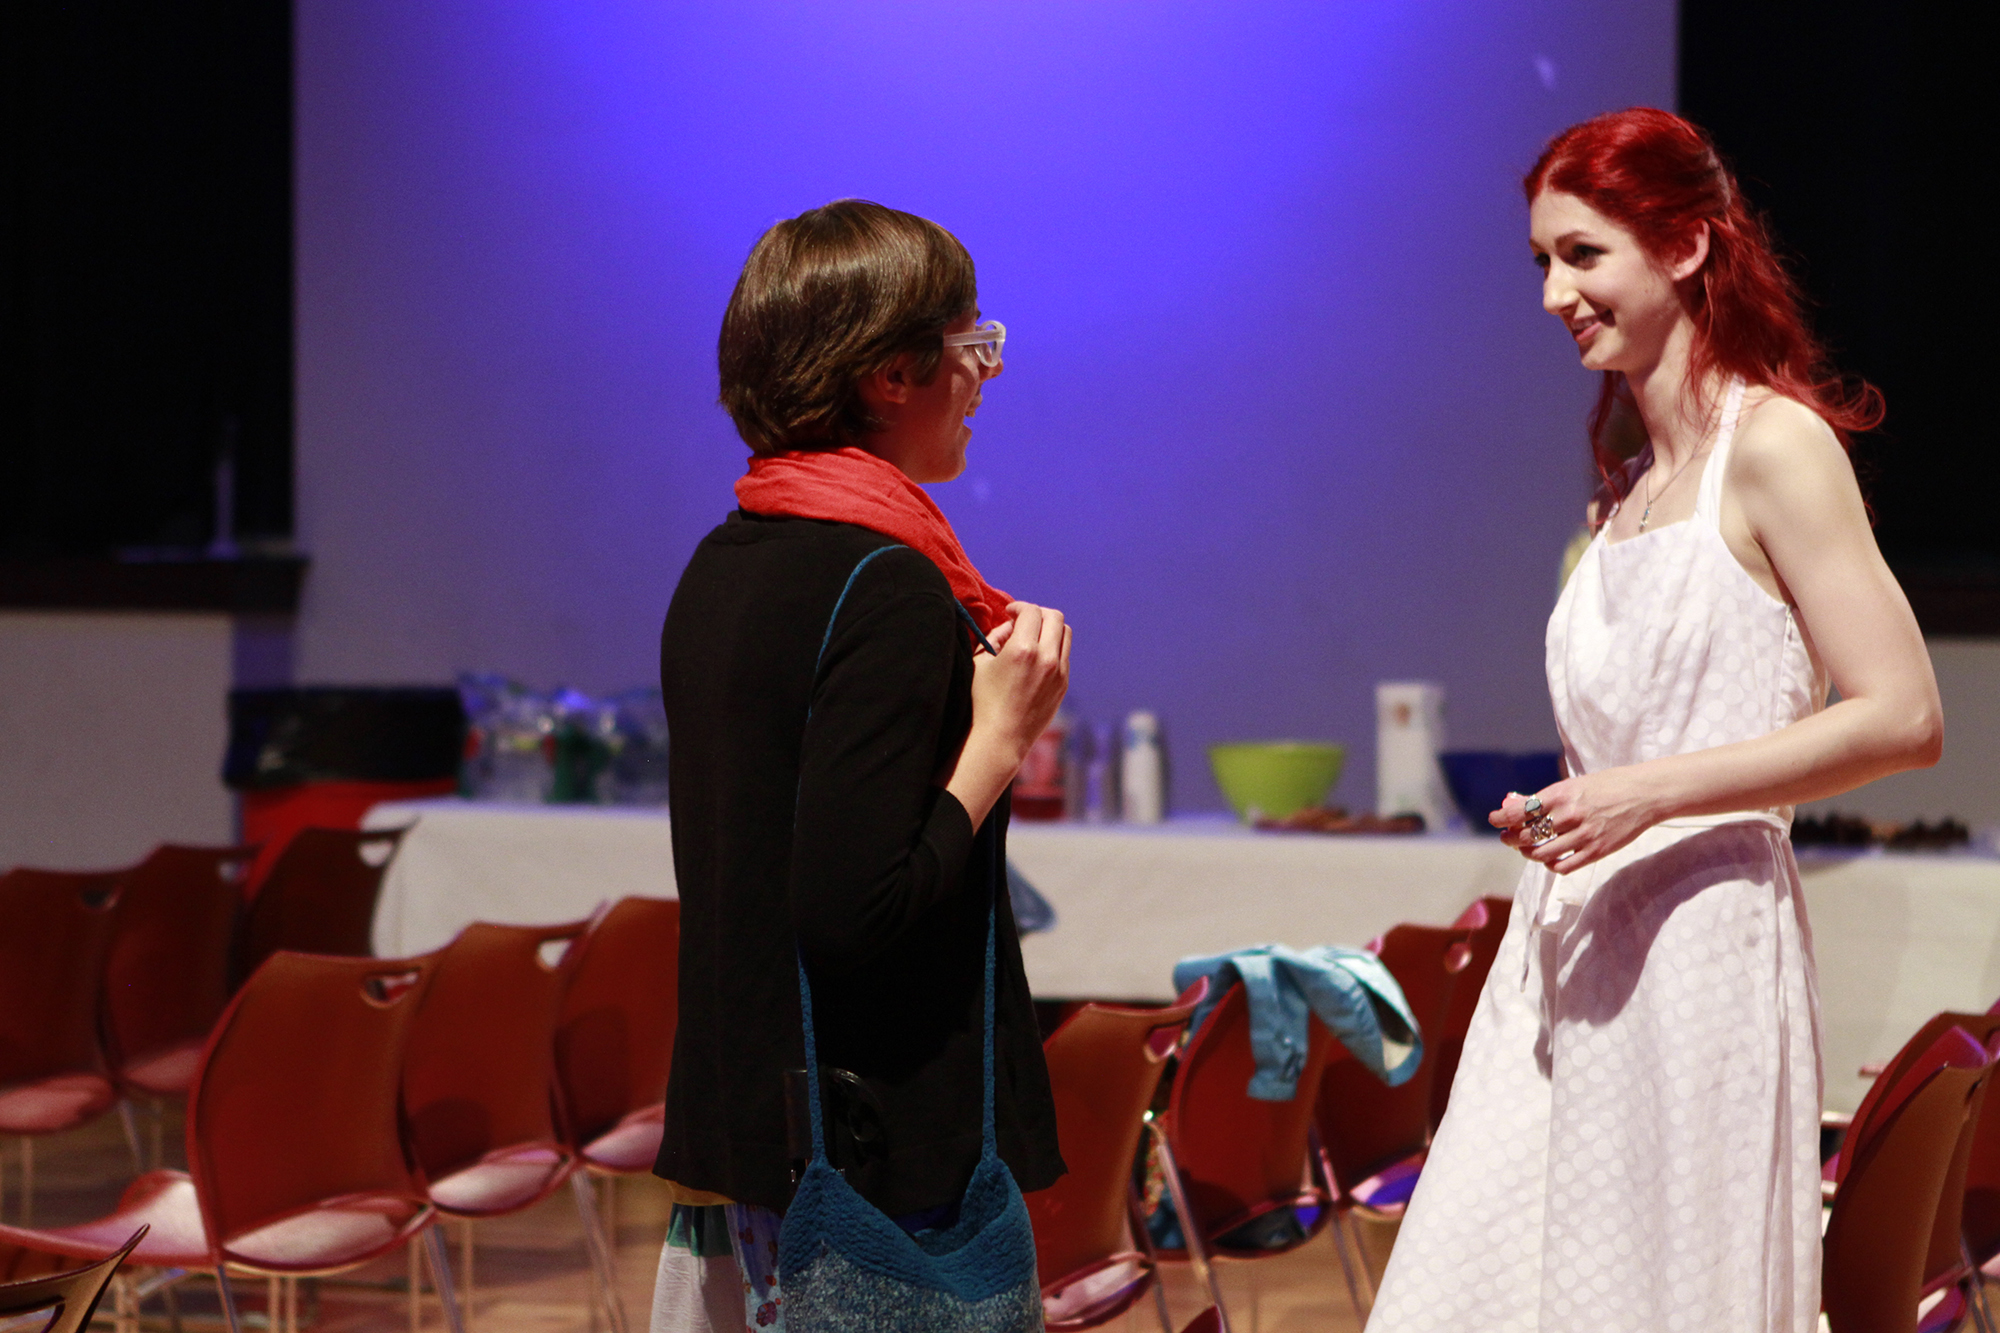 Geena Matuson (@geenamatuson) at the premiere of her thesis film 'My Big Bad Wolf,' 2013.